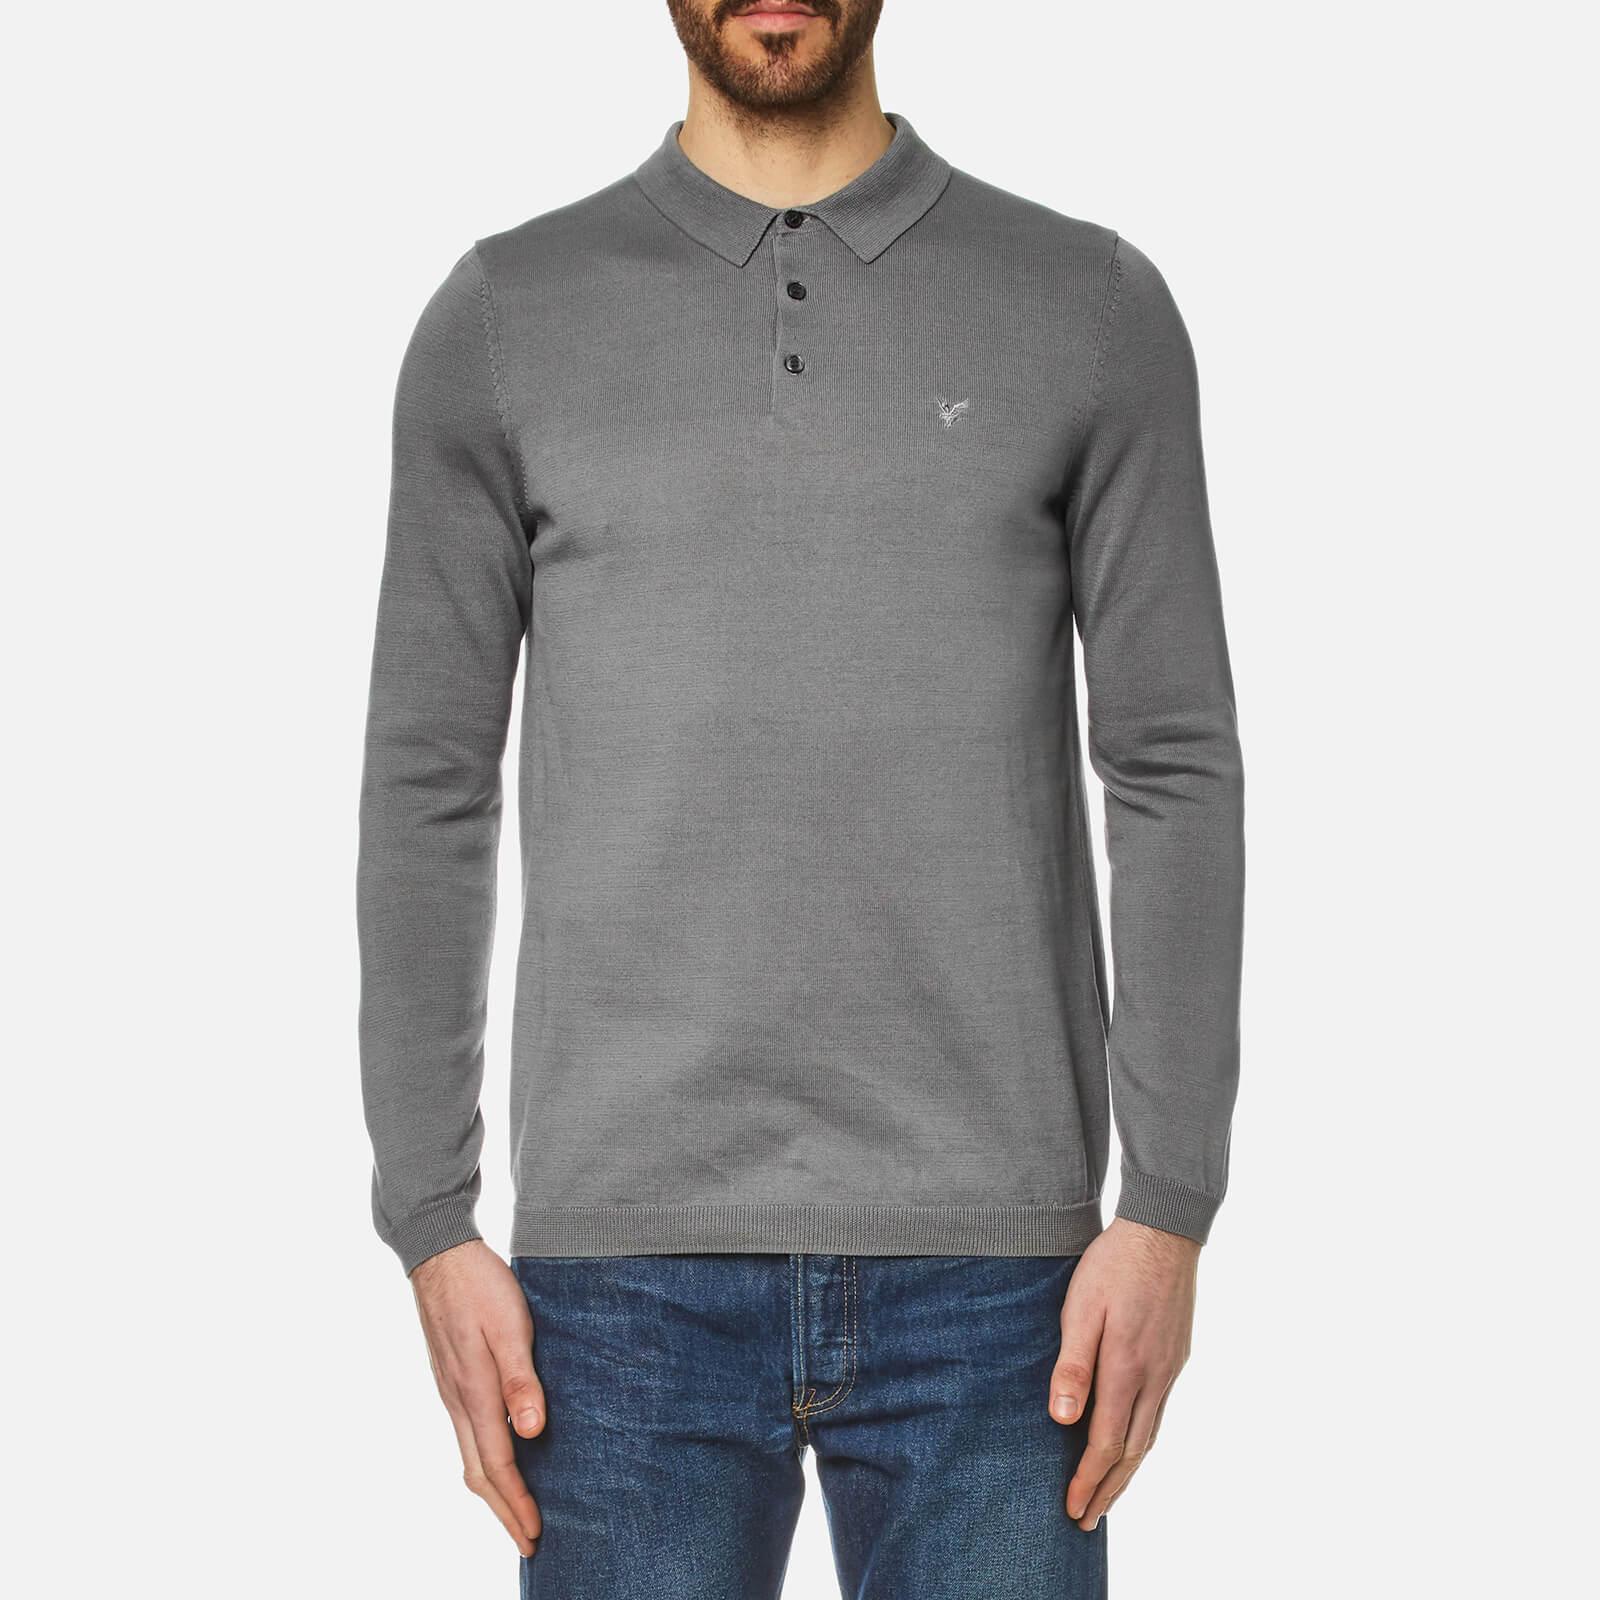 f18d19856648 Lyle & Scott Men's Long Sleeve Mercerised Cotton Knitted Polo Shirt - Mid  Grey Marl Clothing   TheHut.com